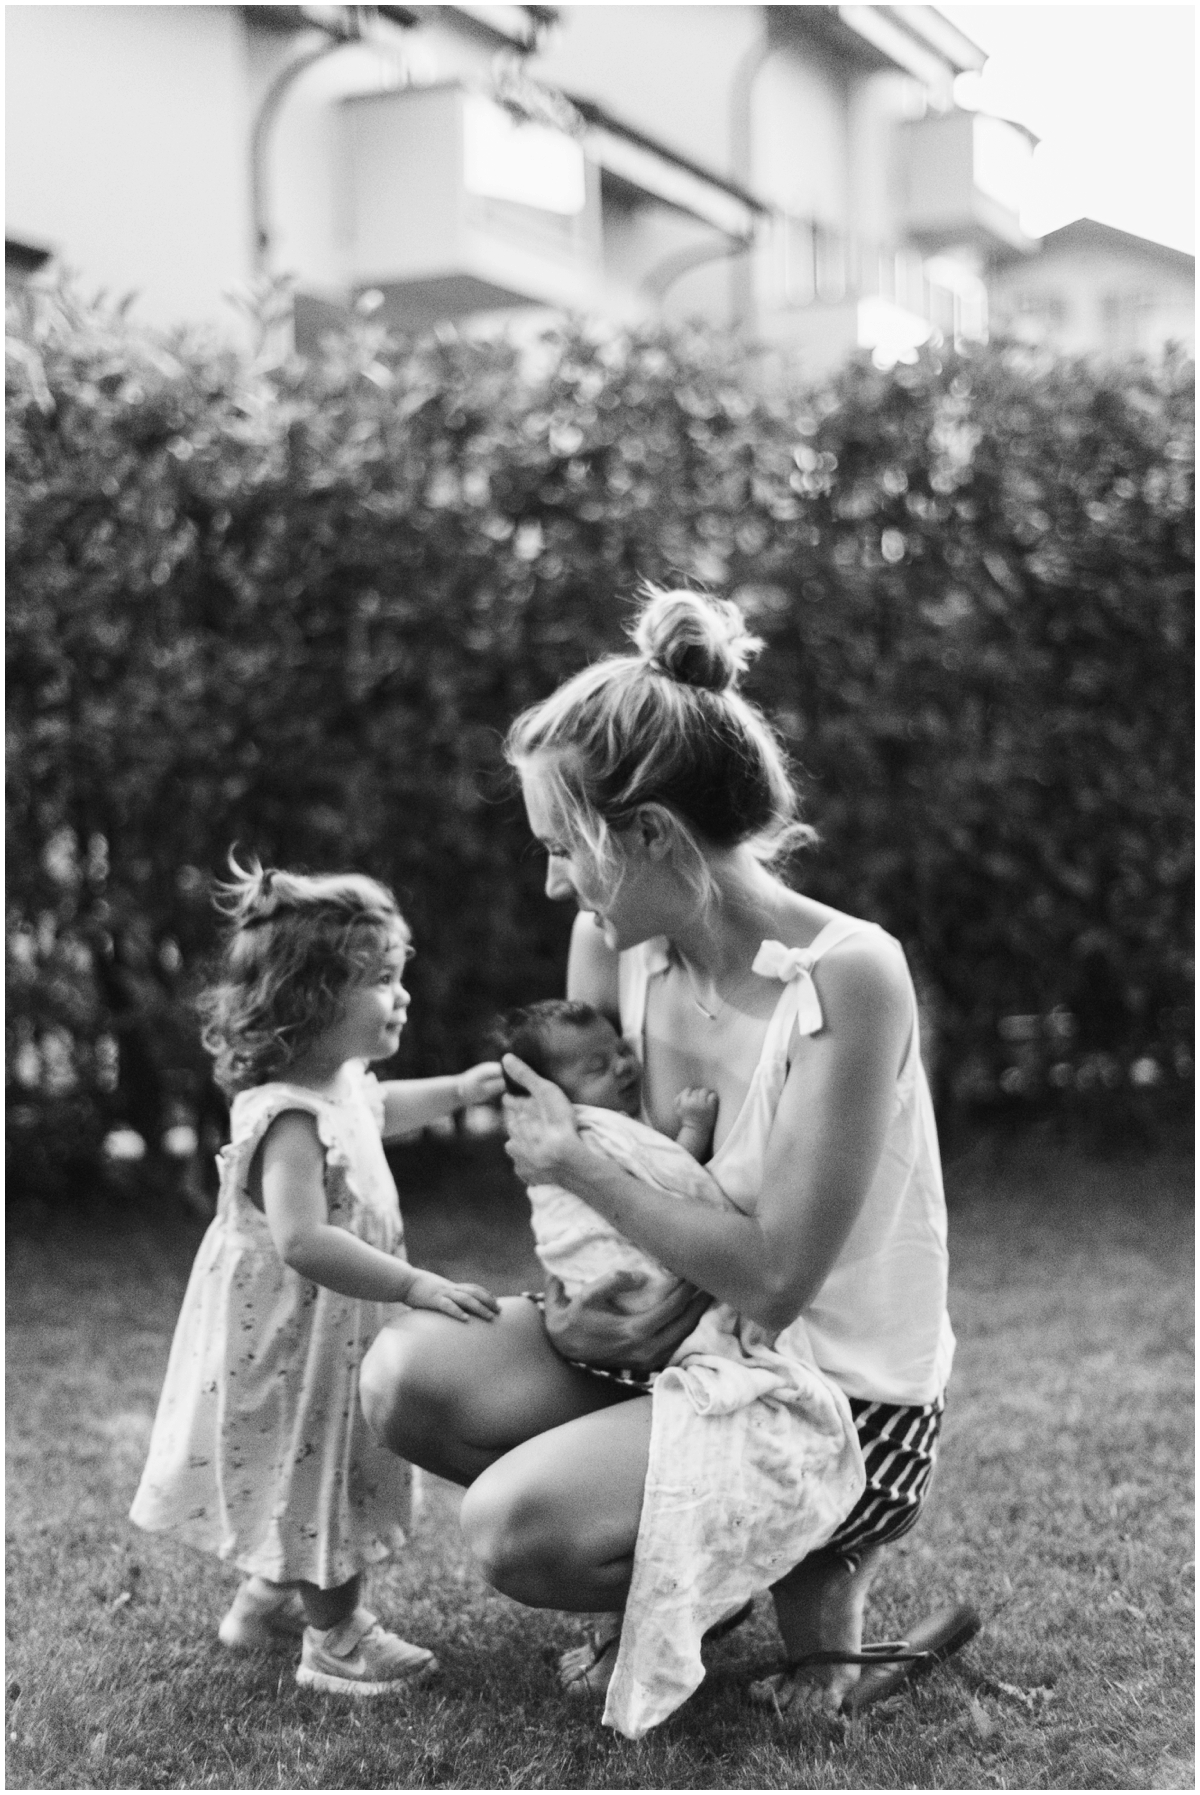 Alea+Lovely+Family+Portraits_0020.jpg